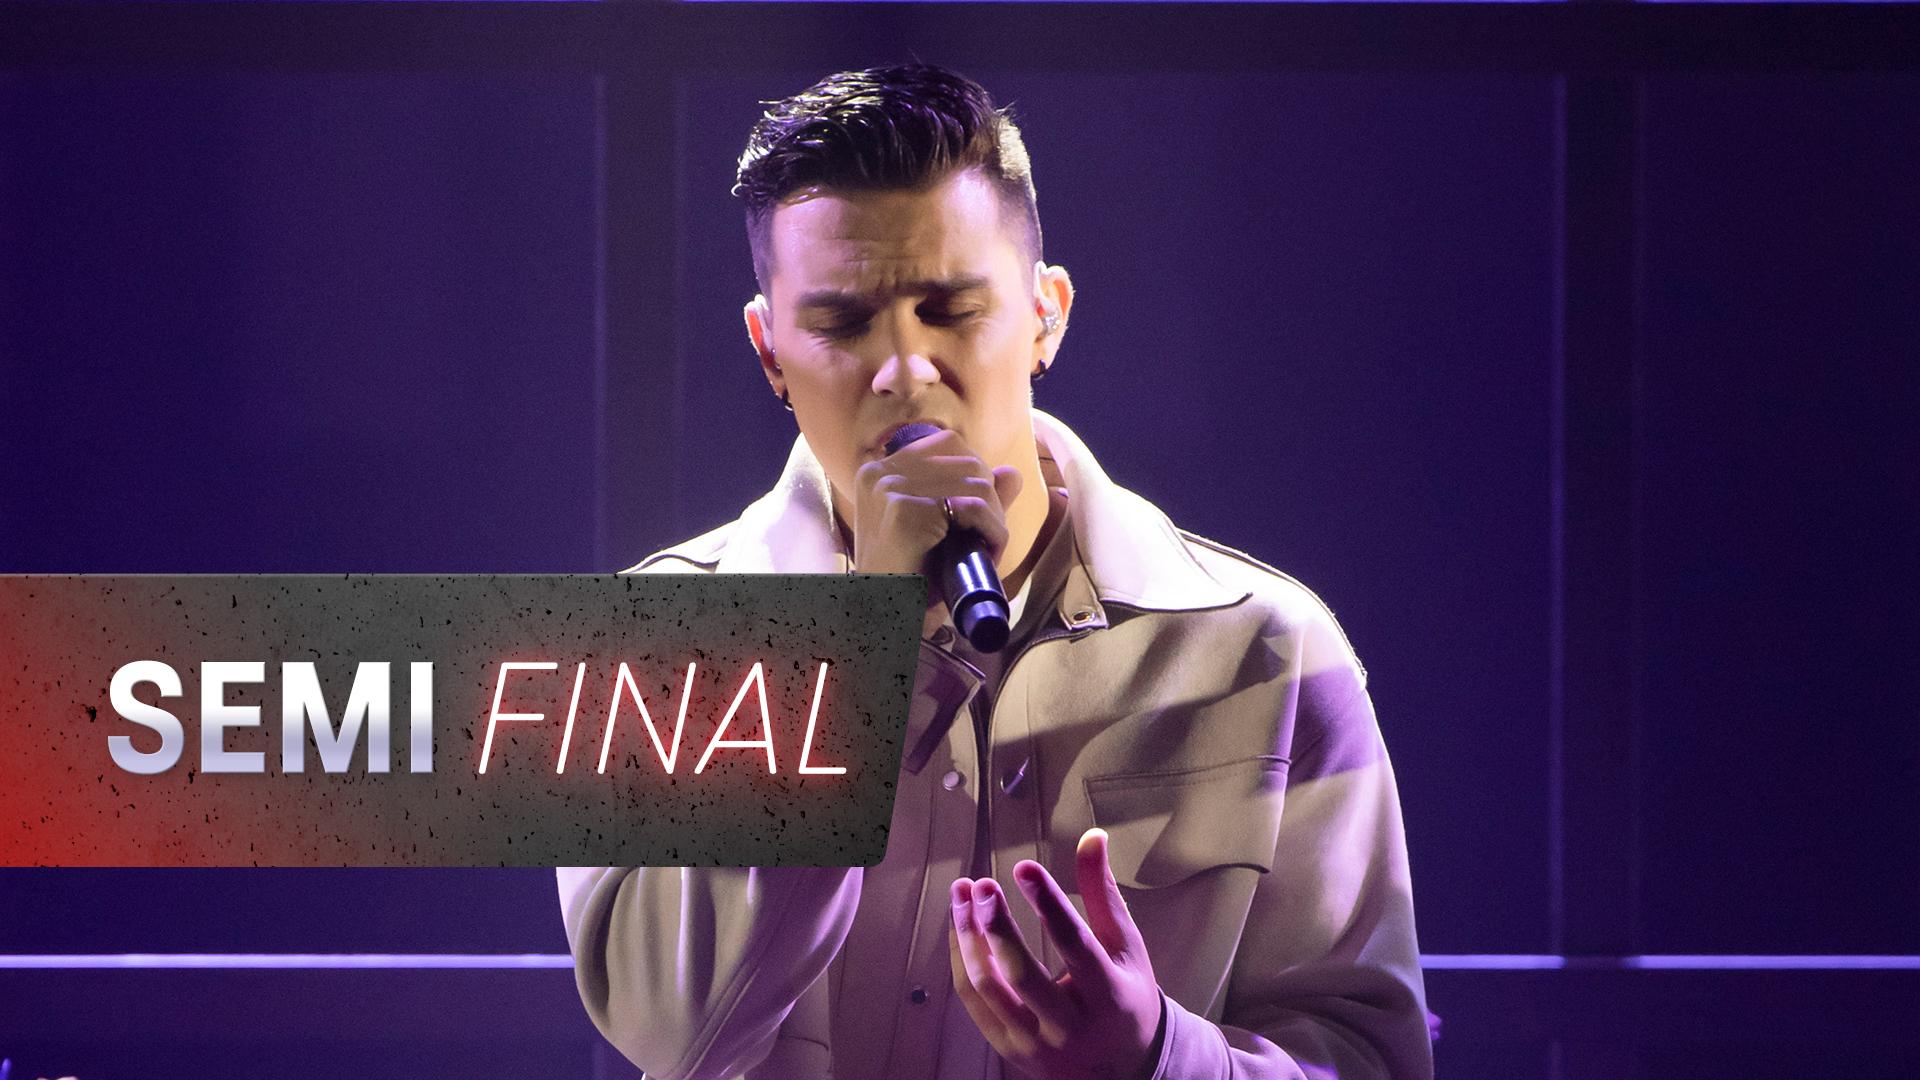 Semi Final: Jesse Teinaki 'Cellophane'